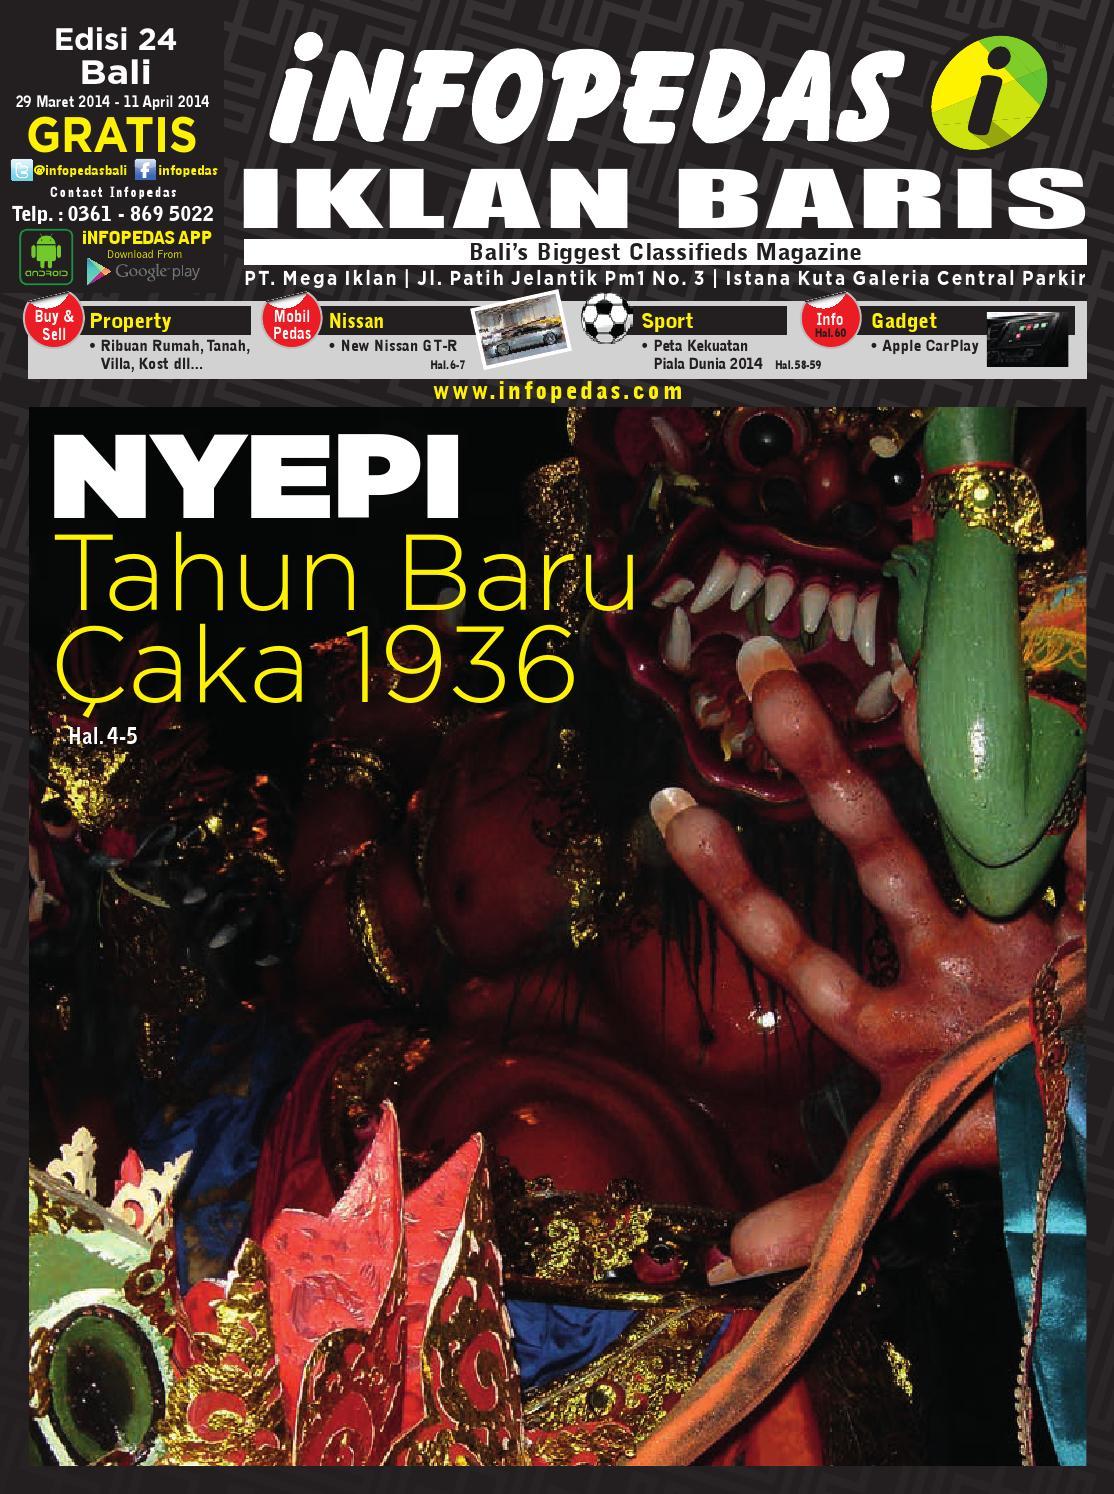 Majalah Infopedas Edisi 24 By Pedas Issuu Tas Untuk Pria D 300 Bmw Merah Biru Laptop Bly 394